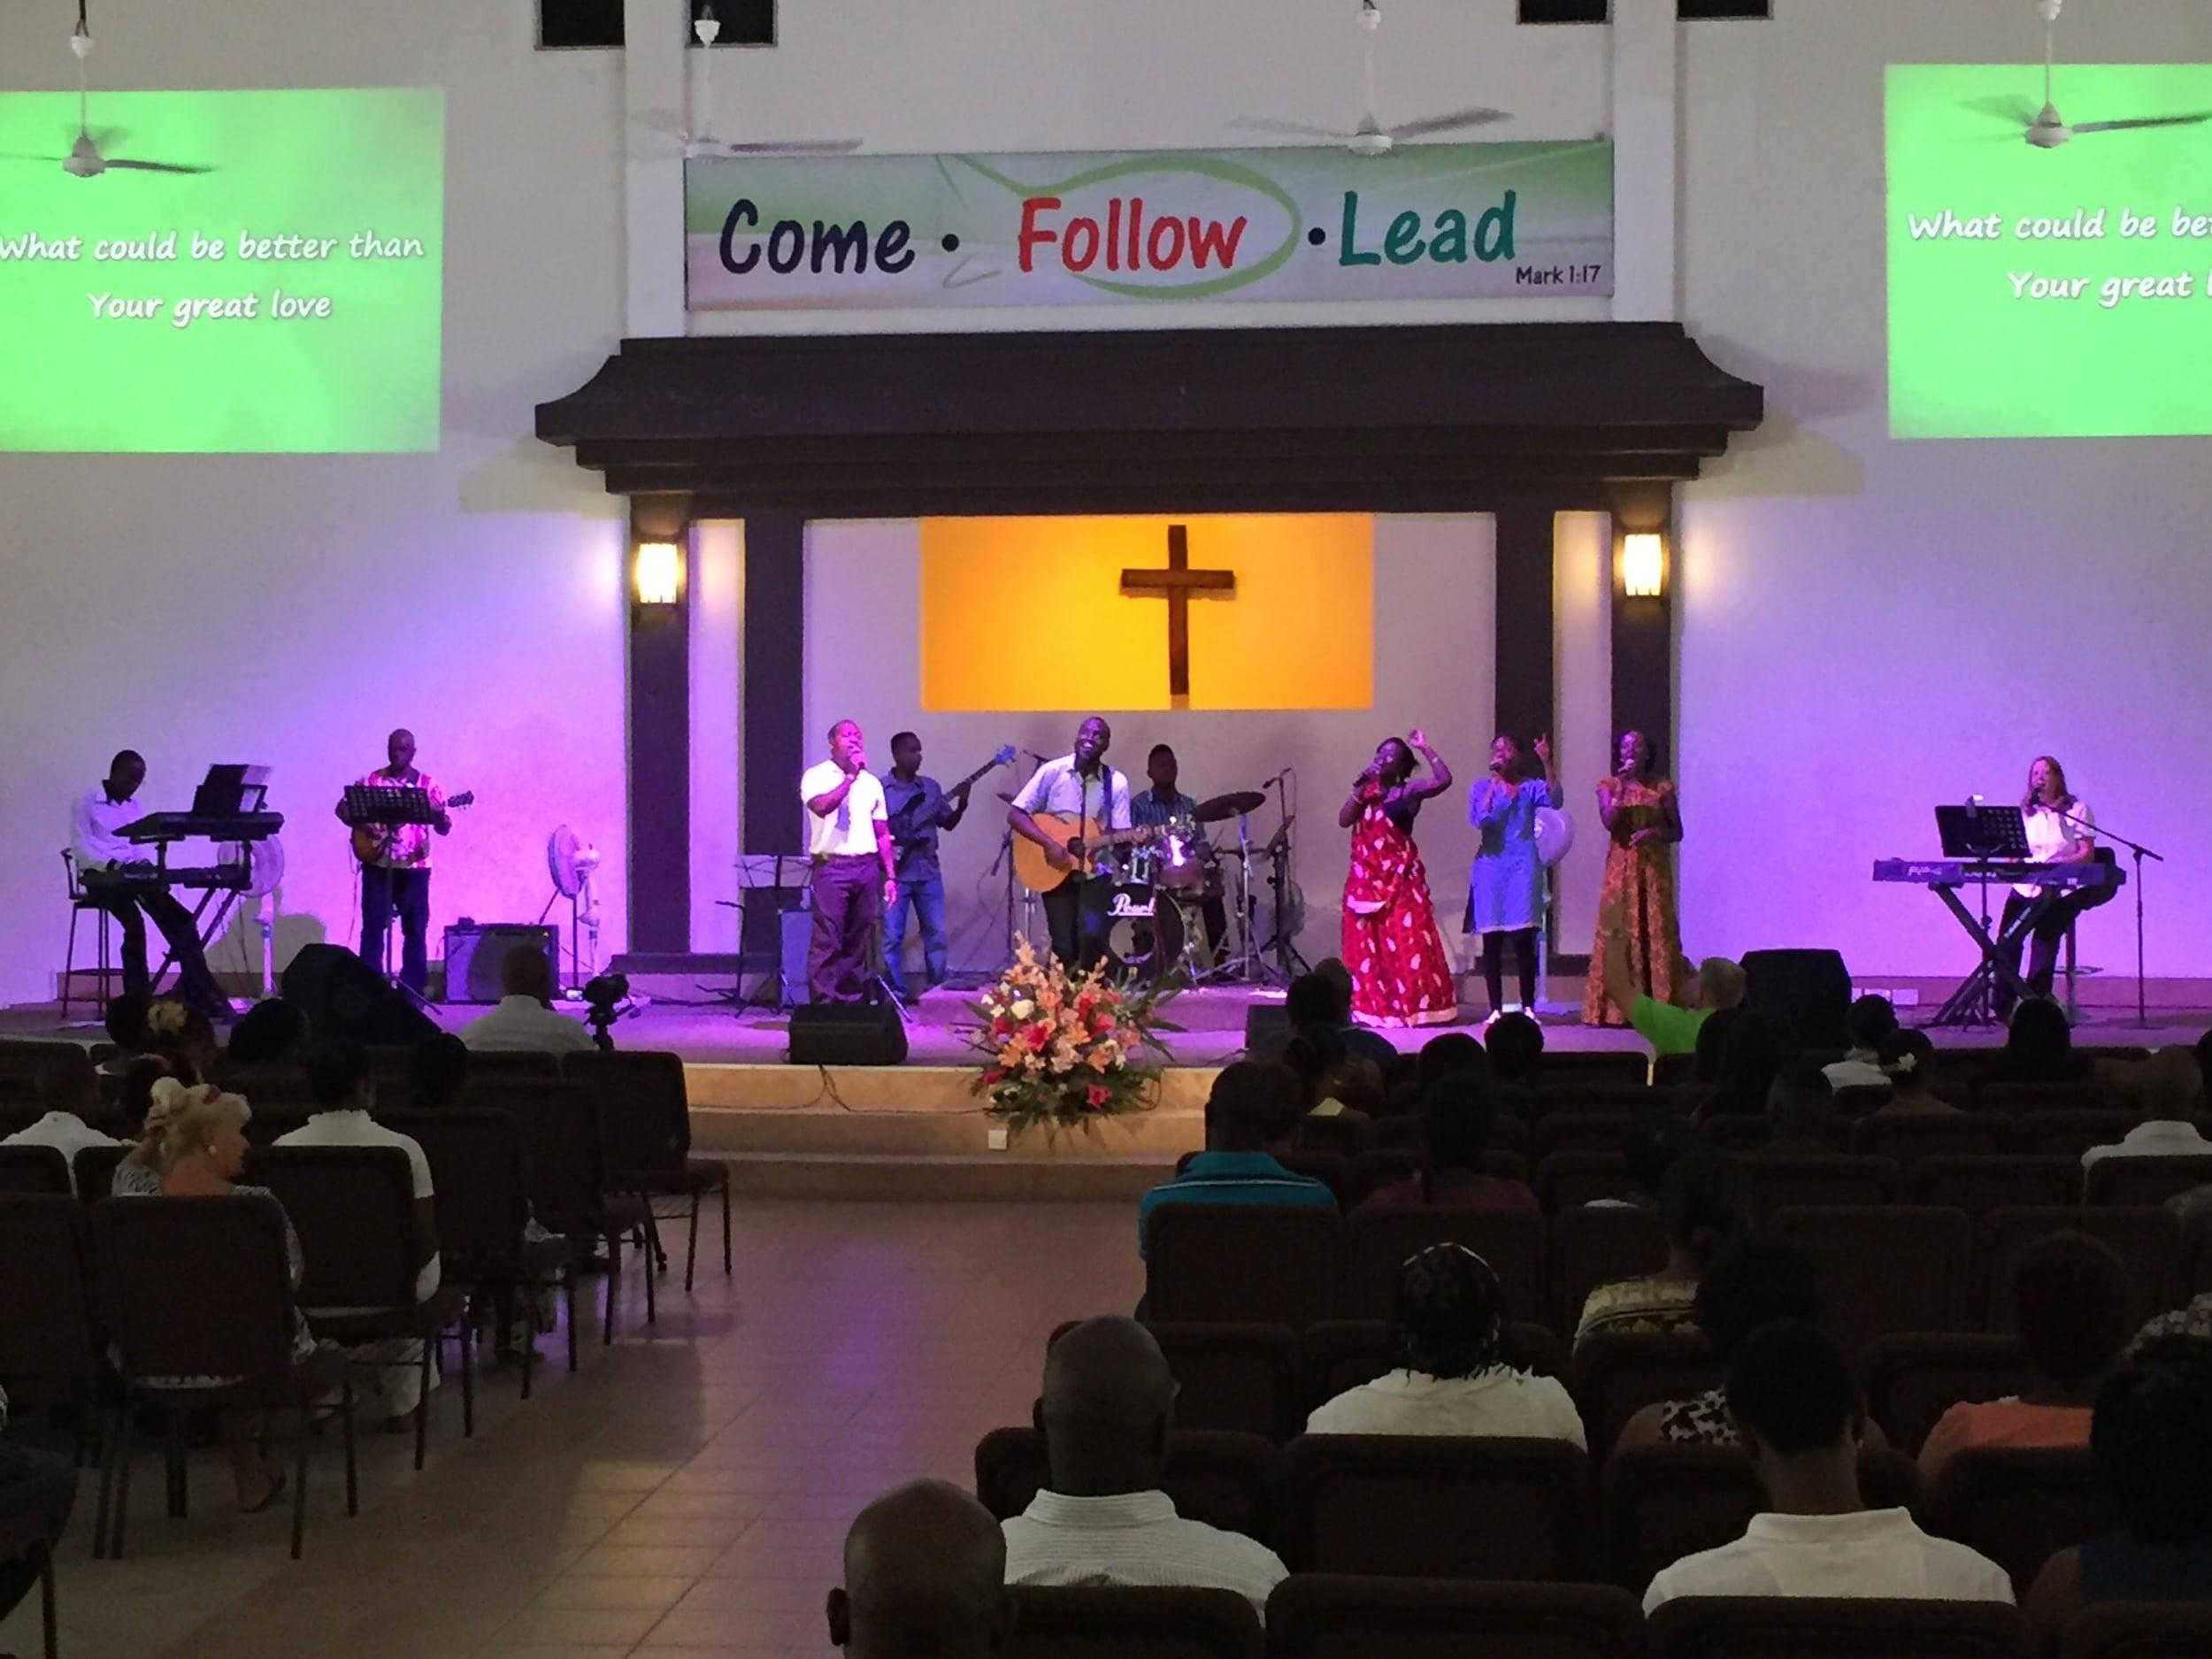 The Crossroads Fellowship worship team